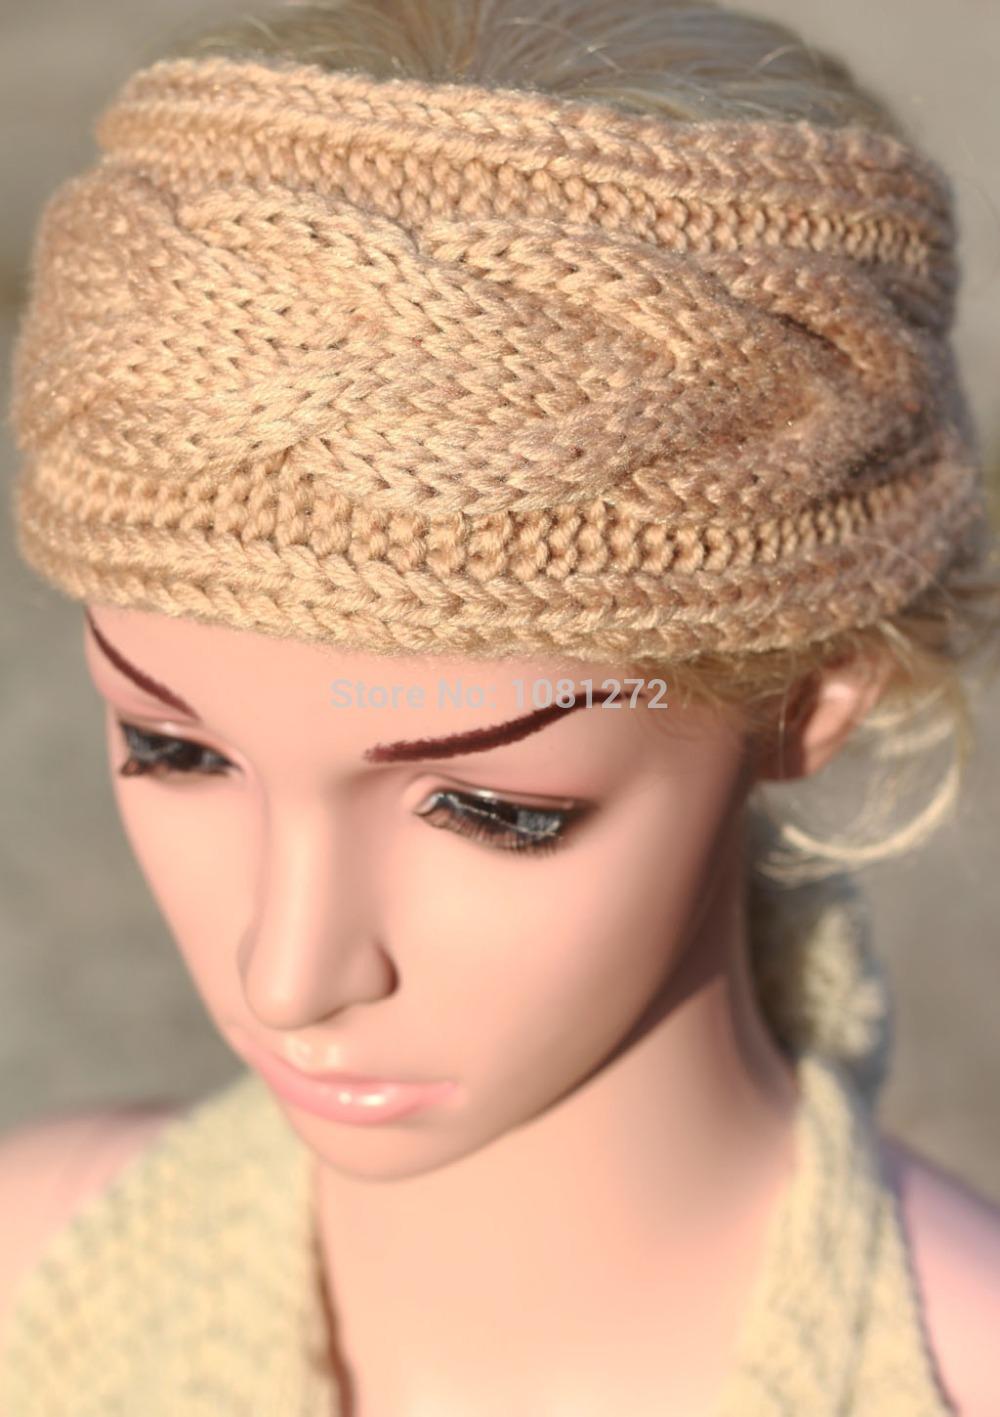 (6pieces/lot) Wholesale Khaki Knit Headband,Cute Turban Headband,Earwarmer Head wrap Fall and winter hair accessory(China (Mainland))